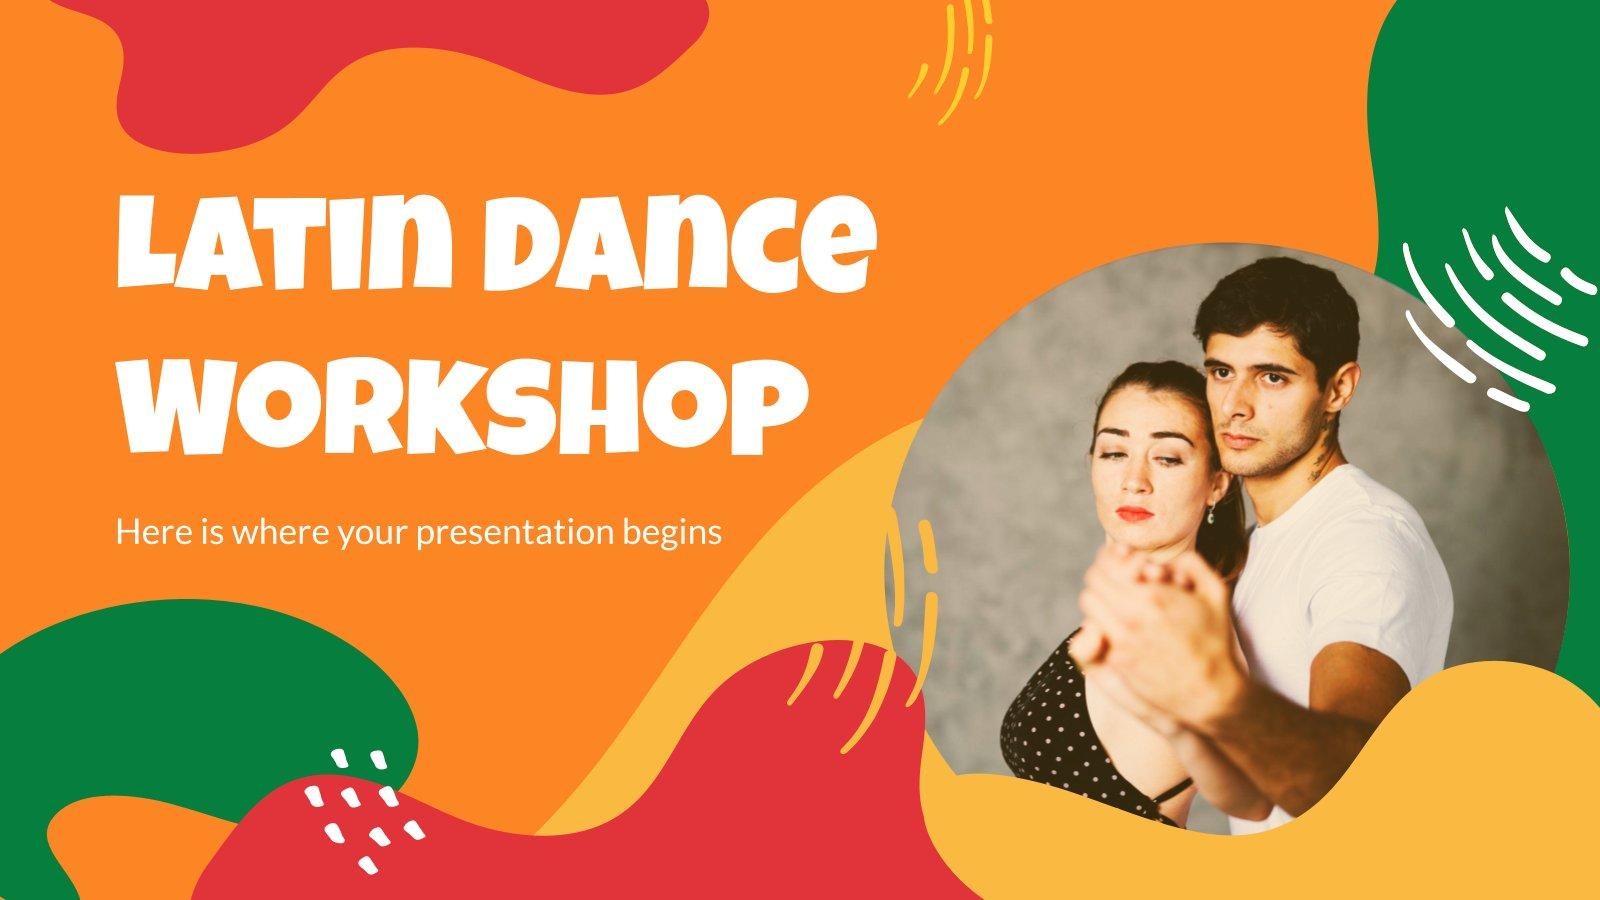 Latin Dance Workshop presentation template